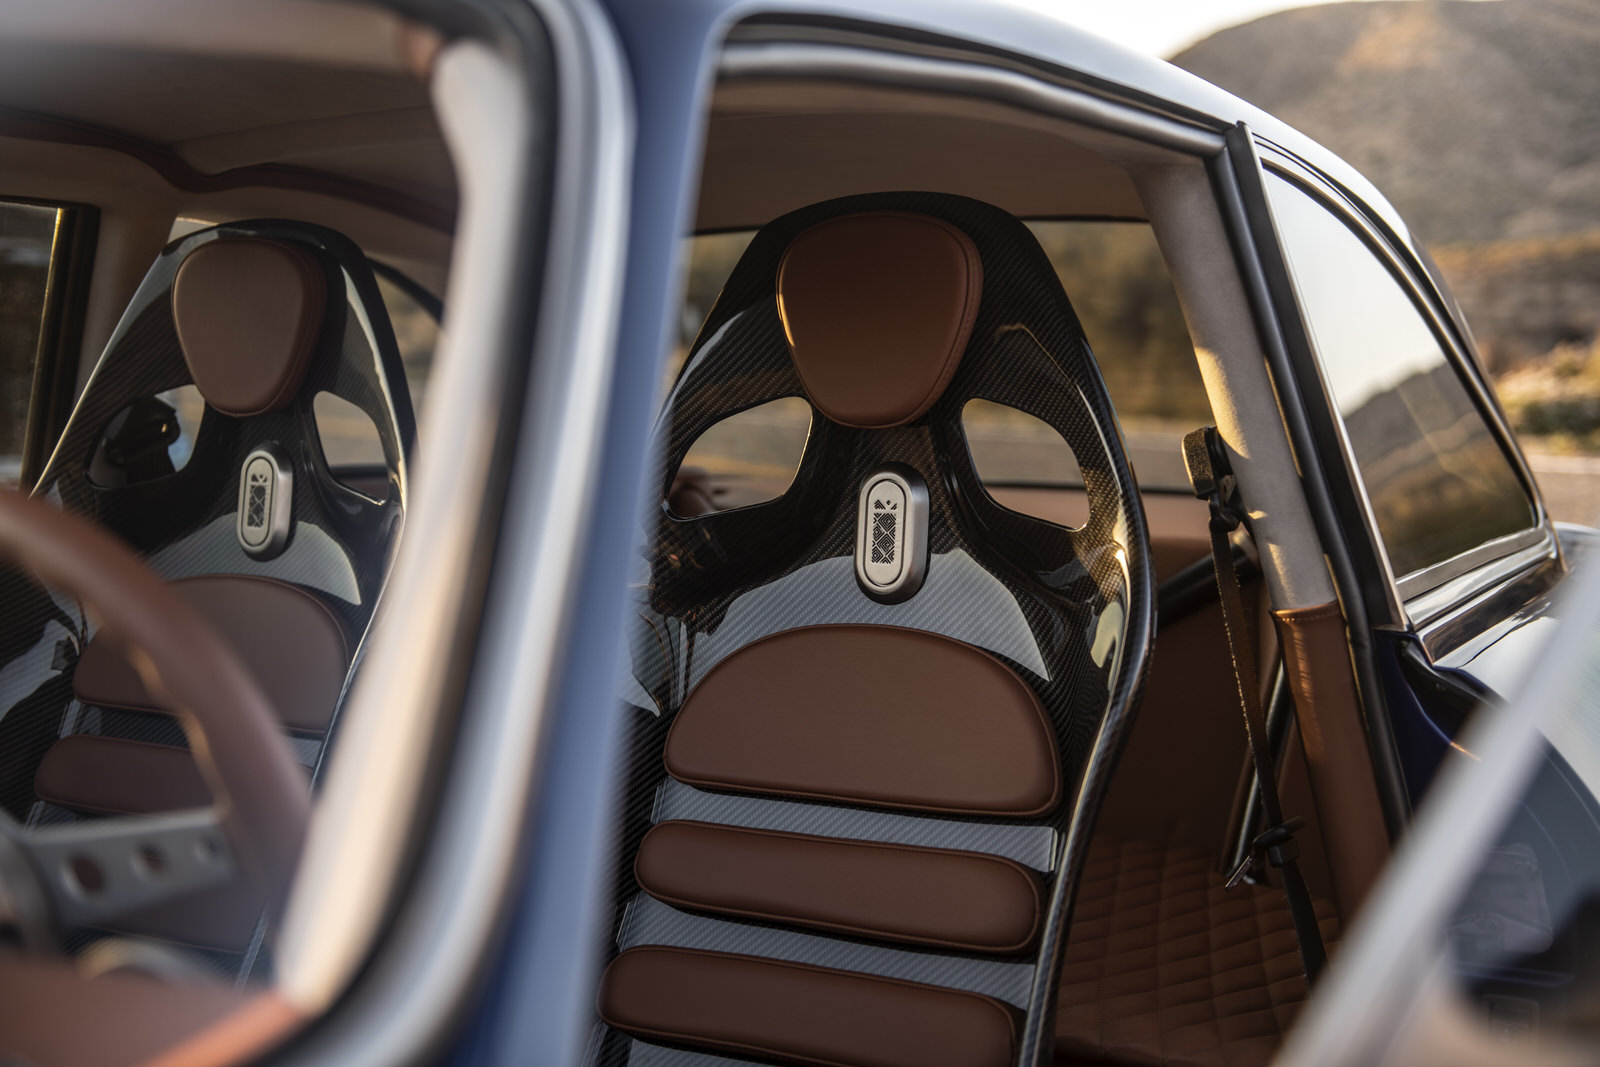 Totem Automobili GT Electric Alfa Romeo 105 Series electric - 2